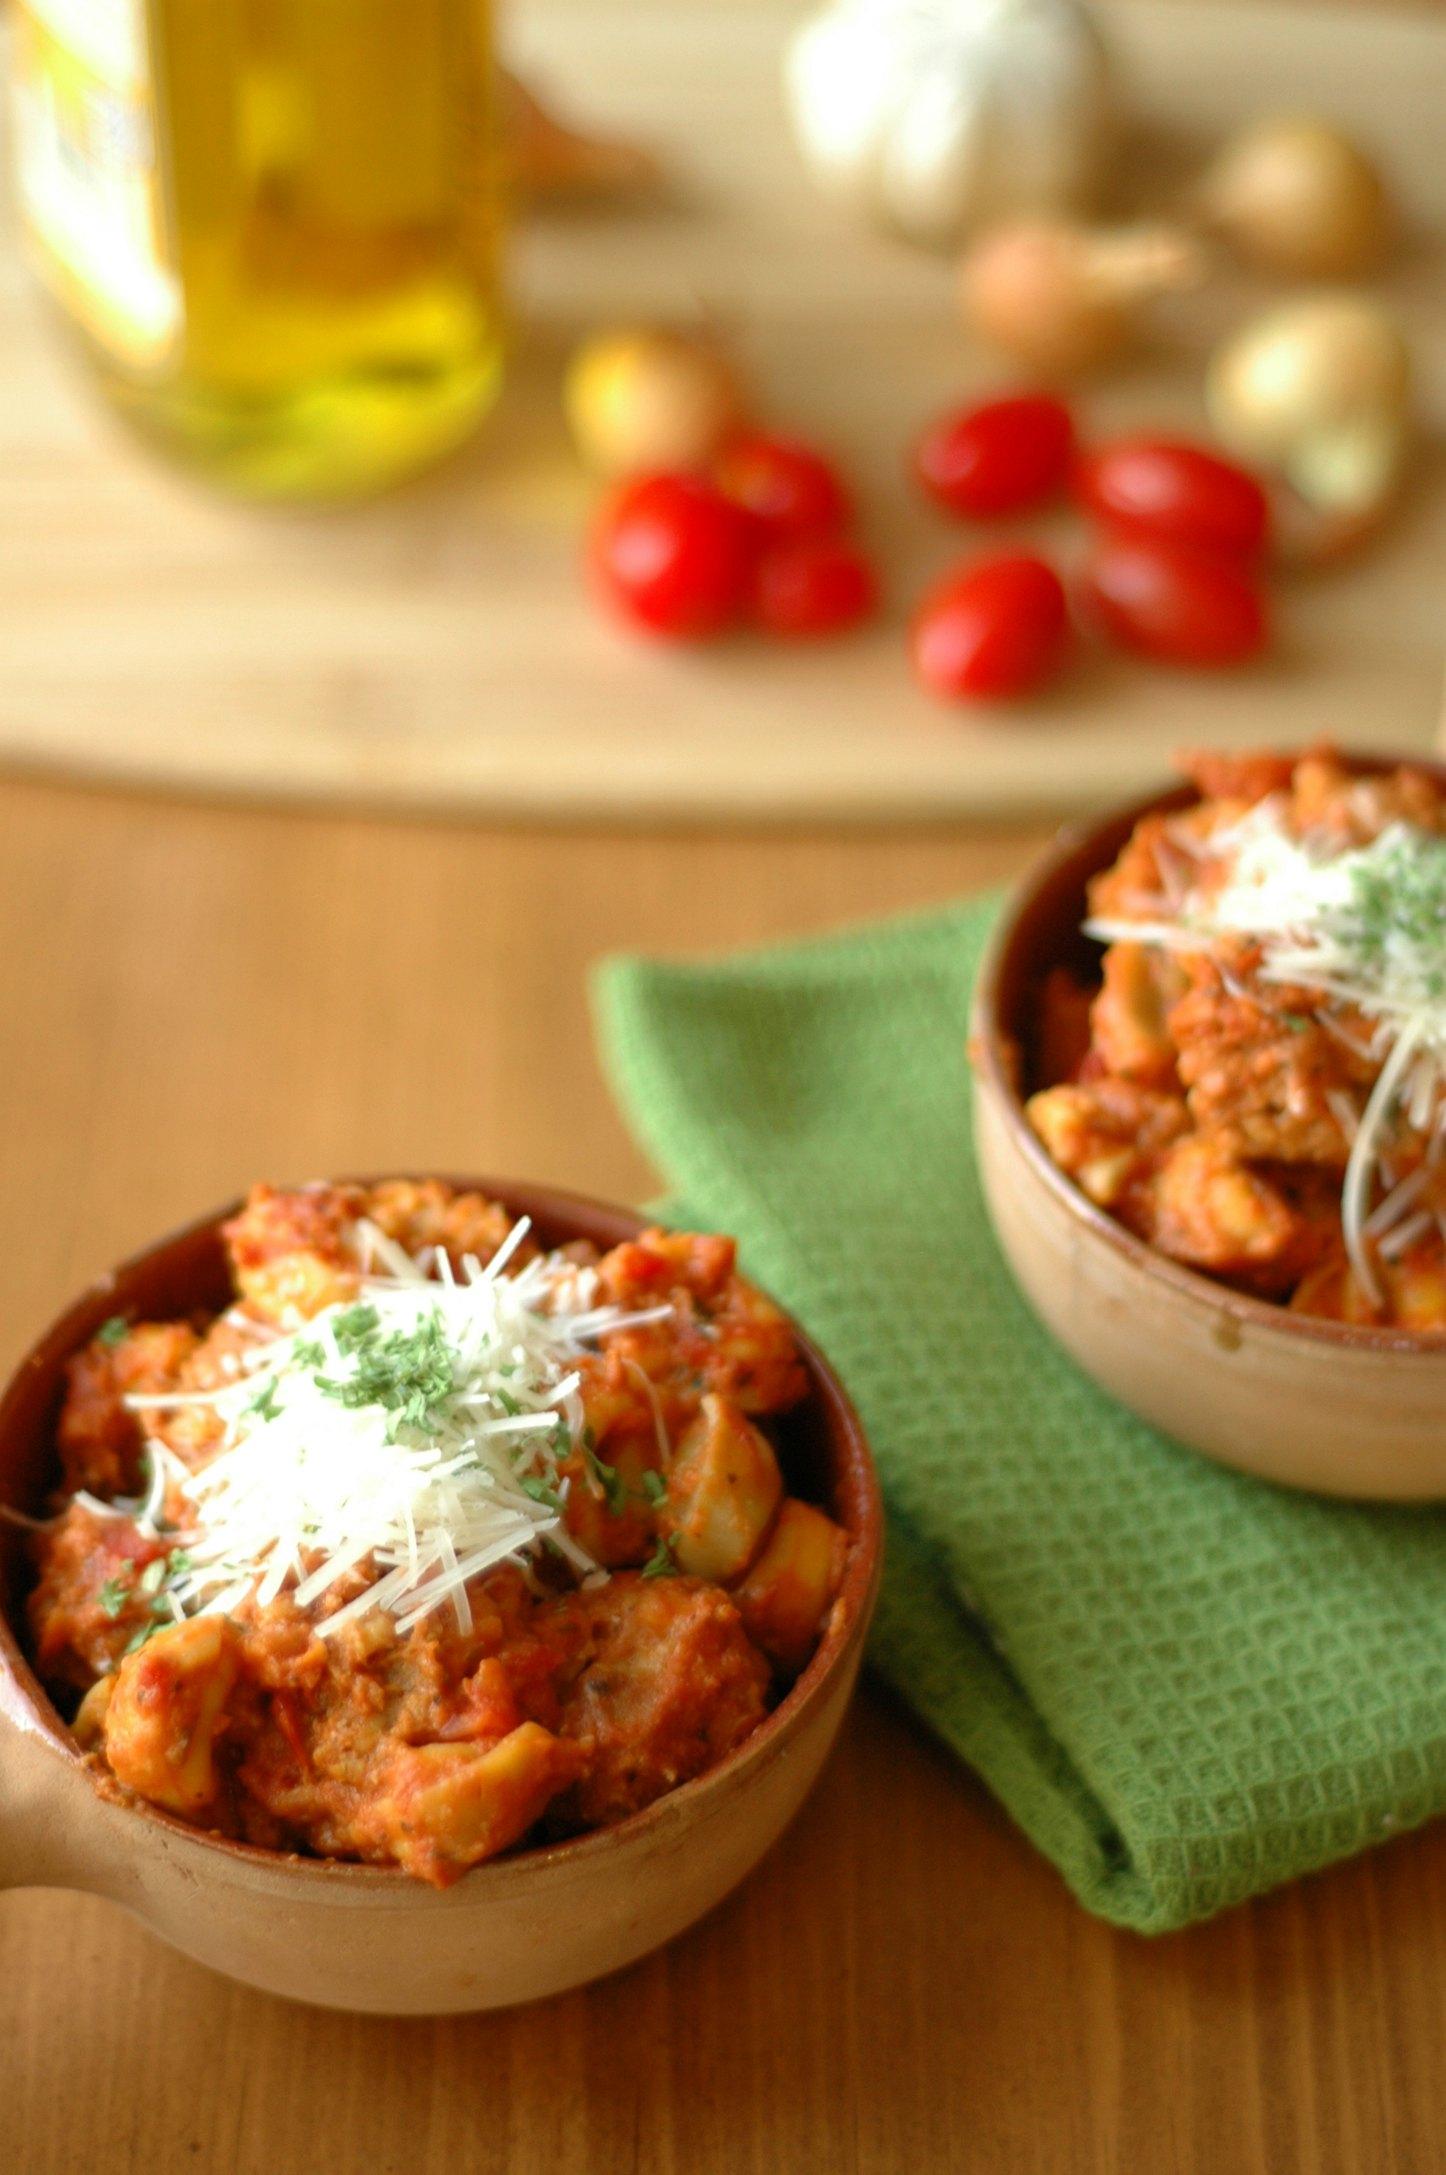 Slow Cooker Tortellini and MIni Meatballs in Tomato Cream Sauce